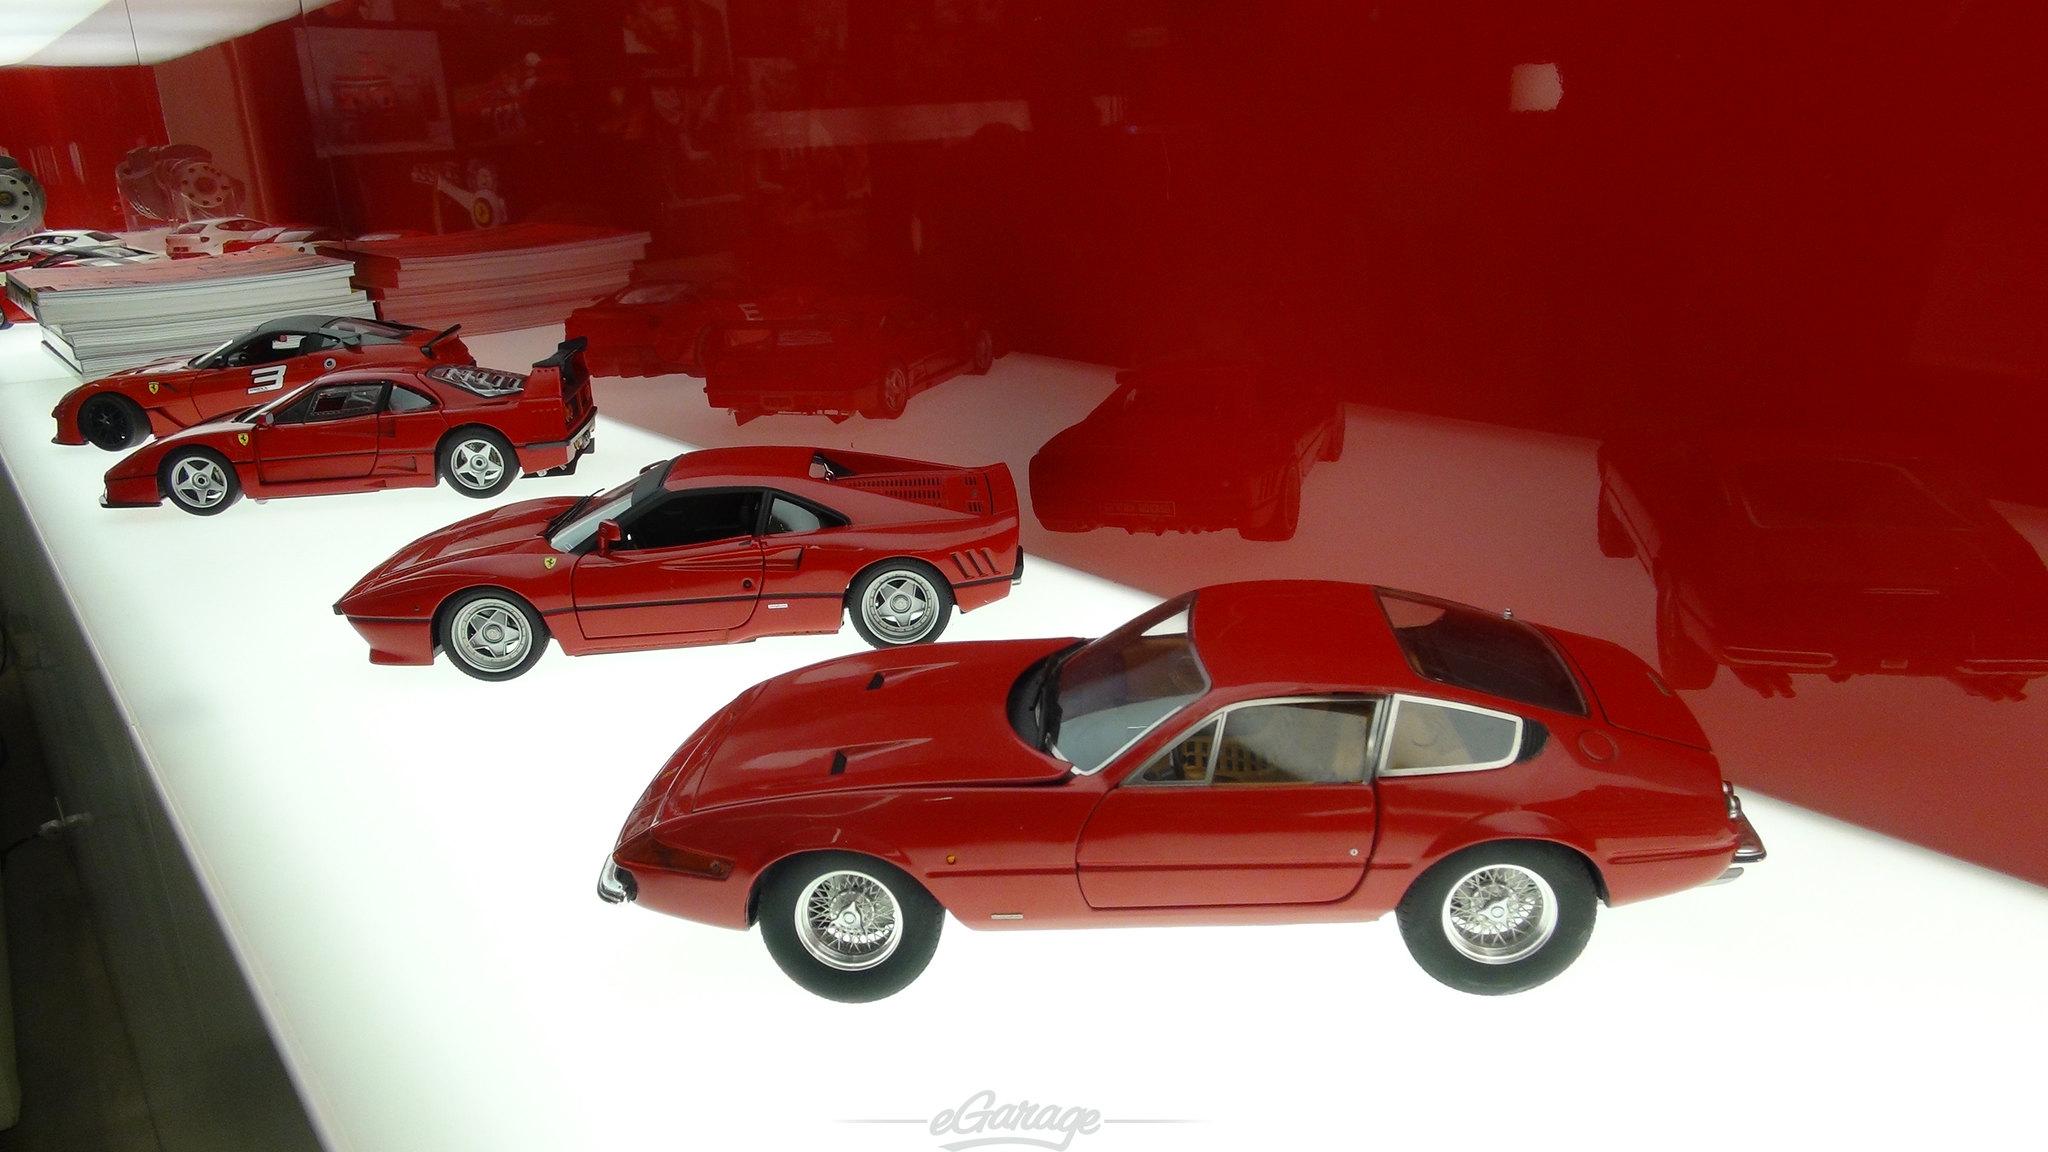 8034745560 53a67d4ee8 k 2012 Paris Motor Show